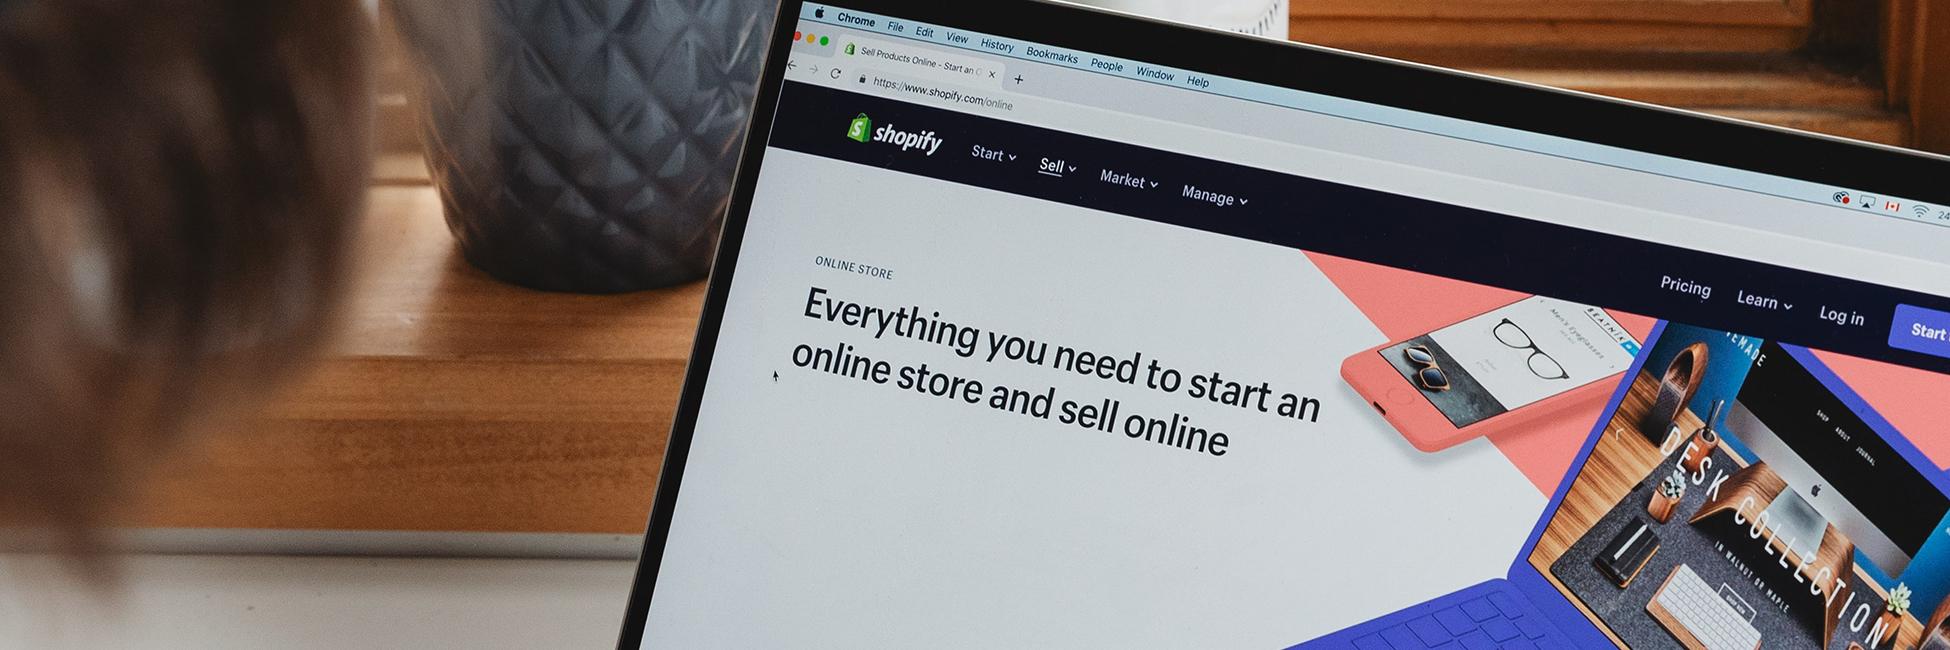 E-commerce will make you millions